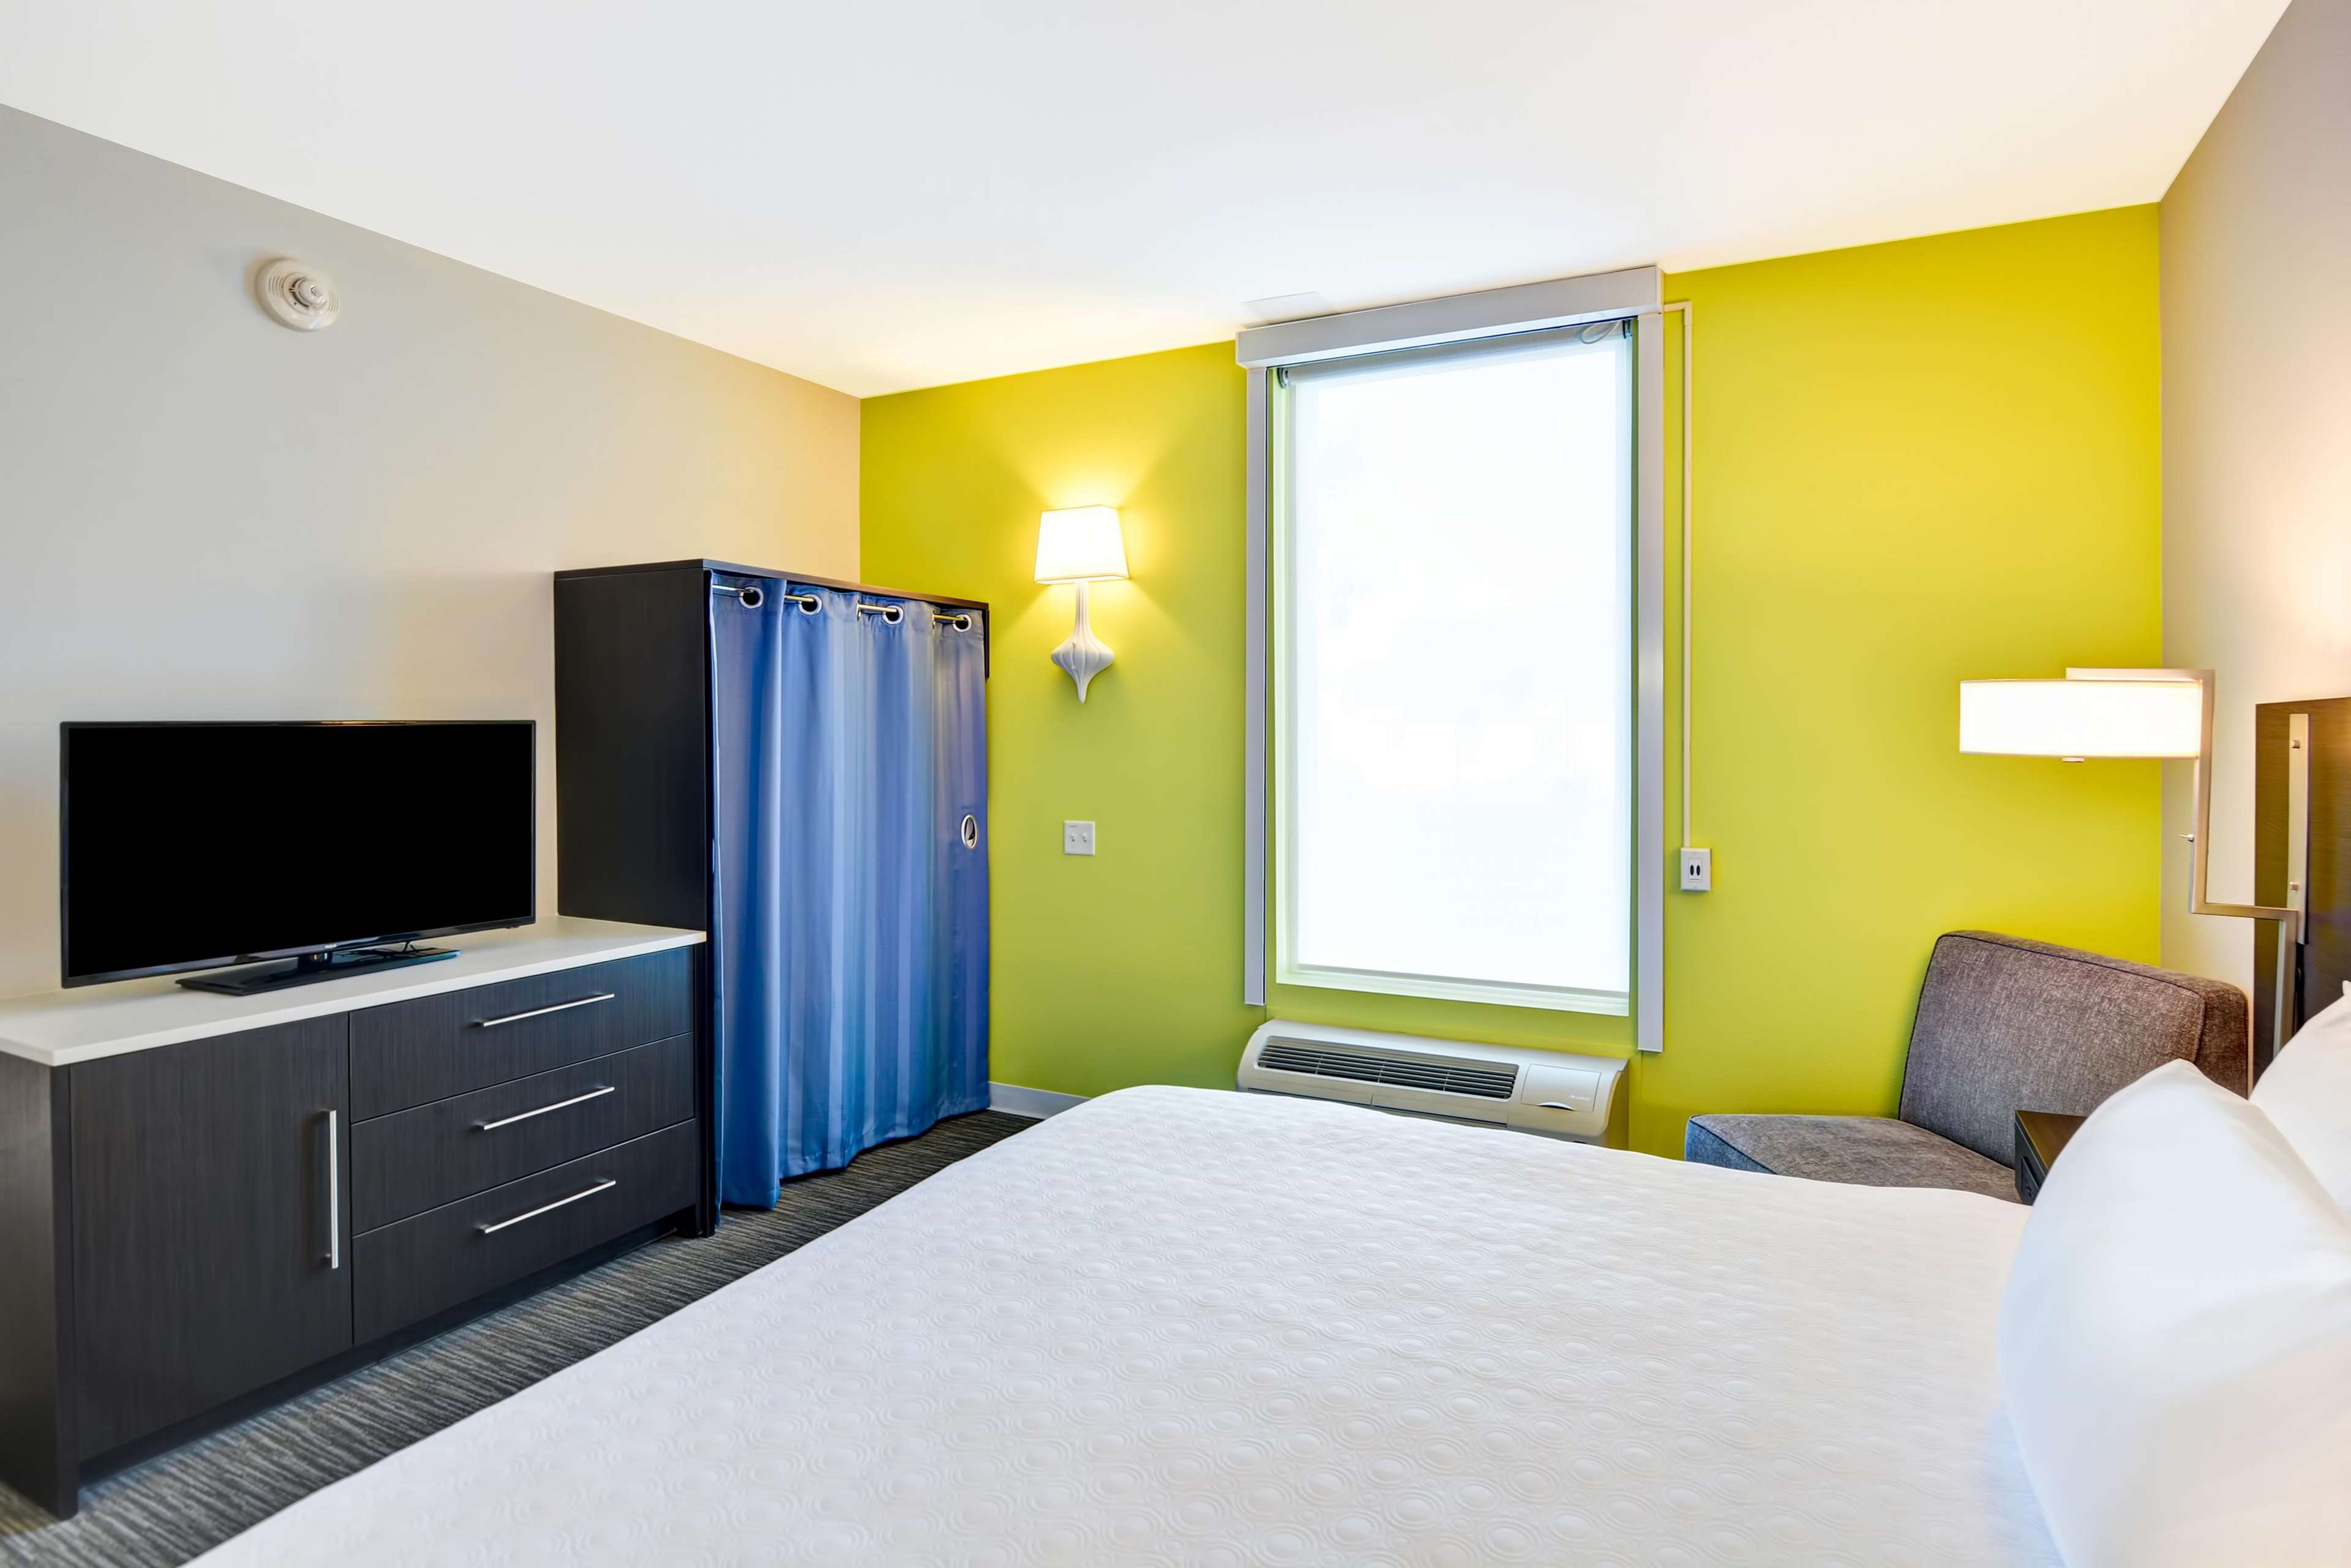 Home2 Suites by Hilton Azusa image 10